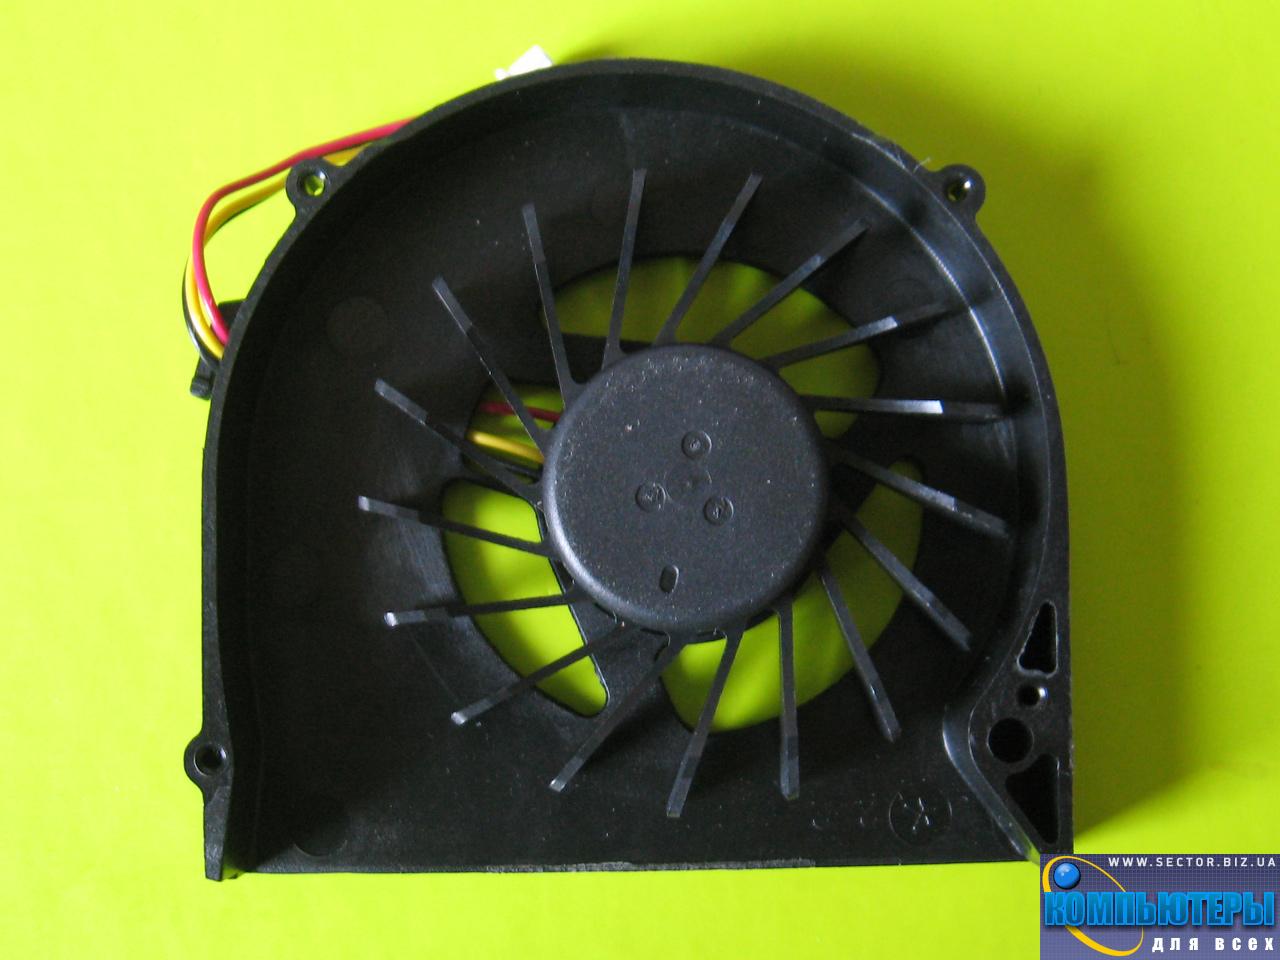 Кулер к ноутбуку Dell Inspiron 15R N5010 M5010 p/n: MF60120V1-B020-G99. Фото № 1.